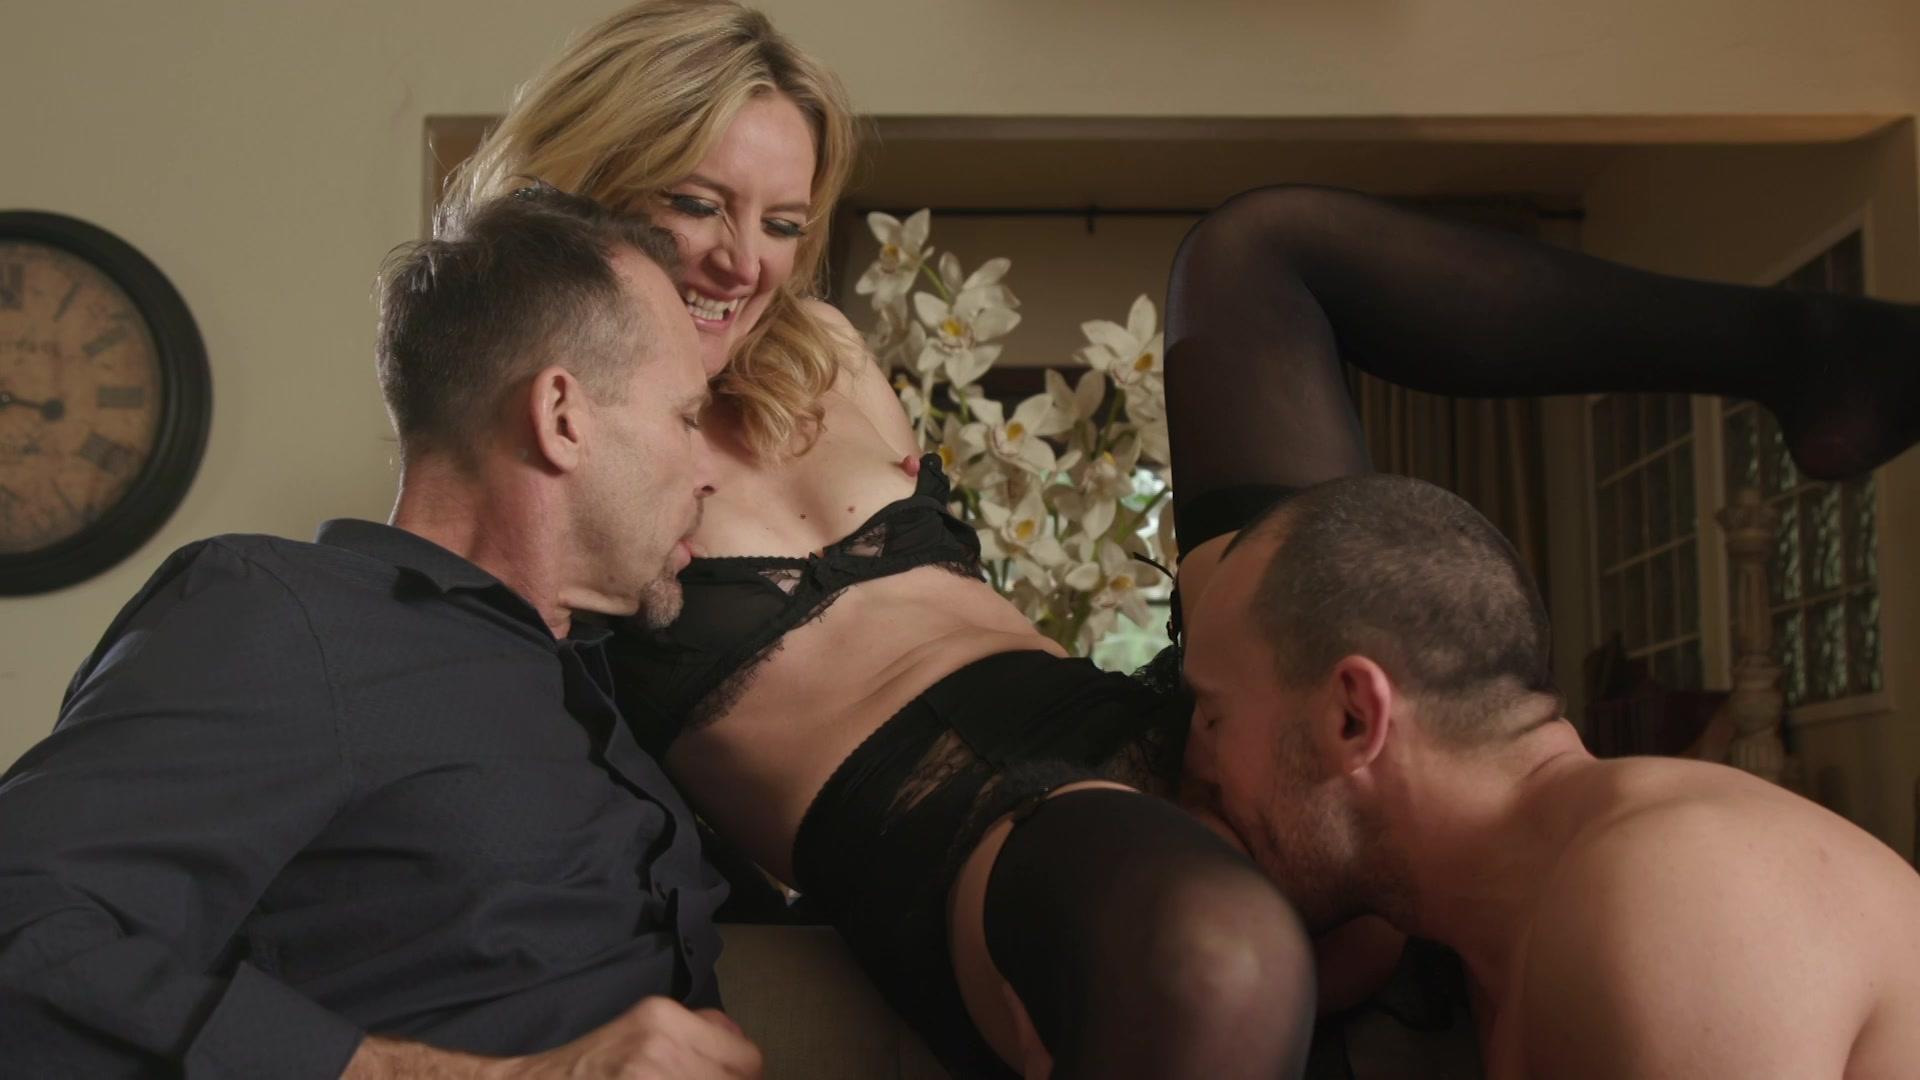 Watch marilyn monroe stag night sex image